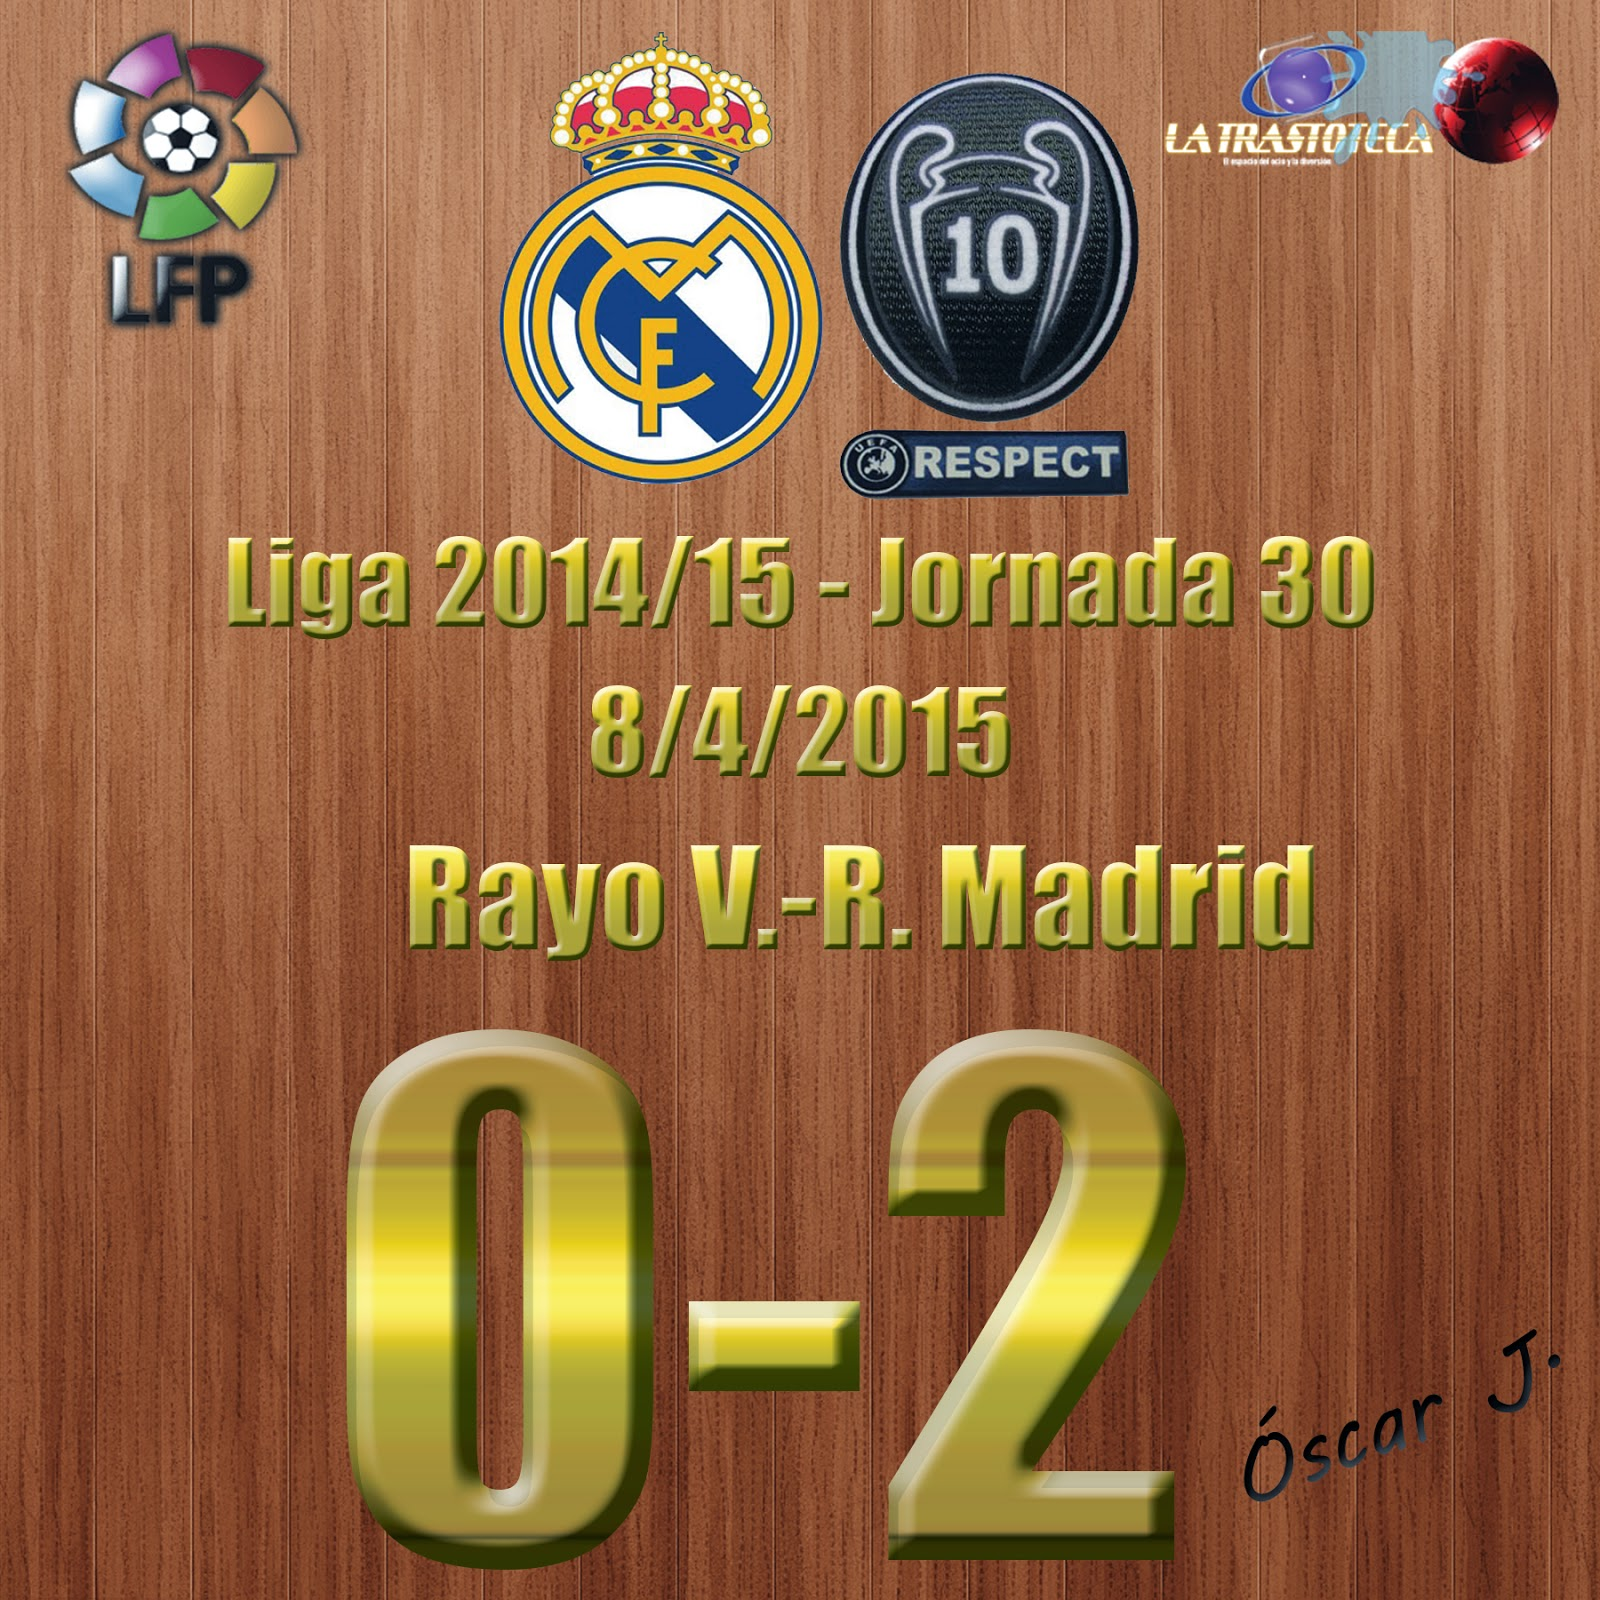 Rayo V. 0-2 Real Madrid - Liga 2014/15 - Jornada 30 - (8/4/2015)